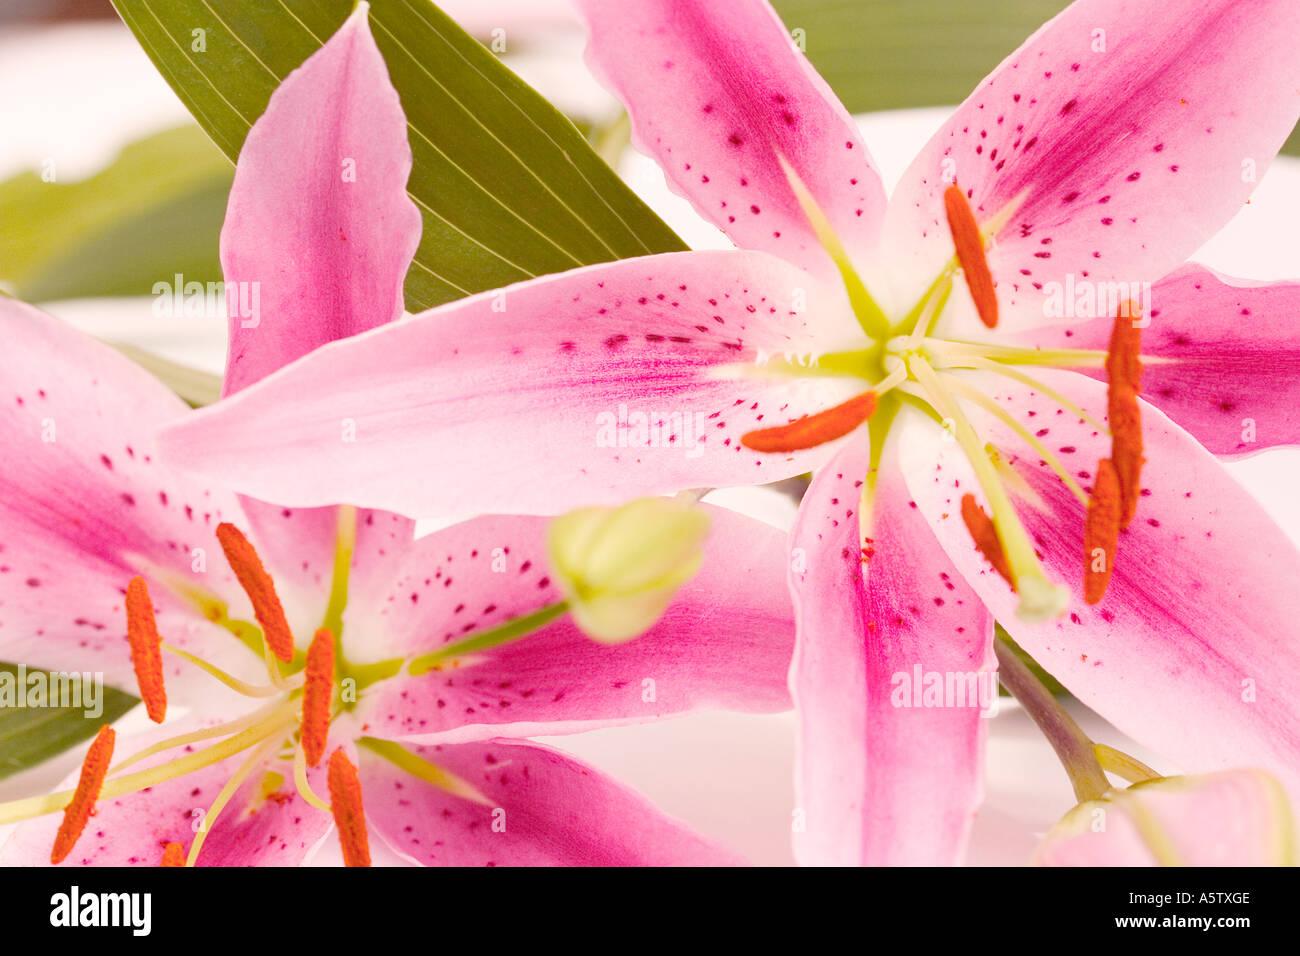 Trumpet Flowers Exotic Lily Lilium Stock Photos Trumpet Flowers